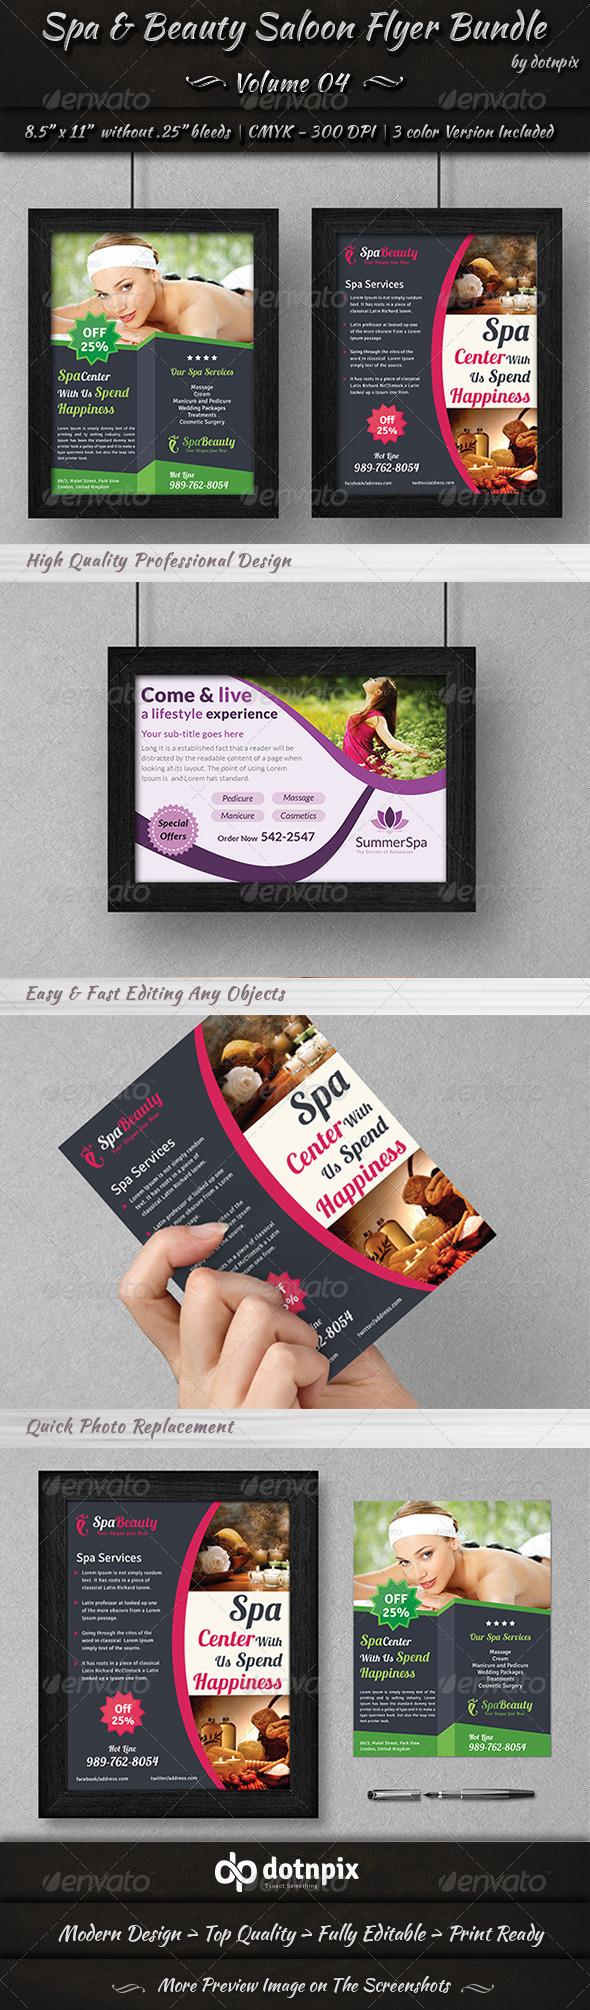 Spa & Beauty Saloon Flyer Bundle Volume 4